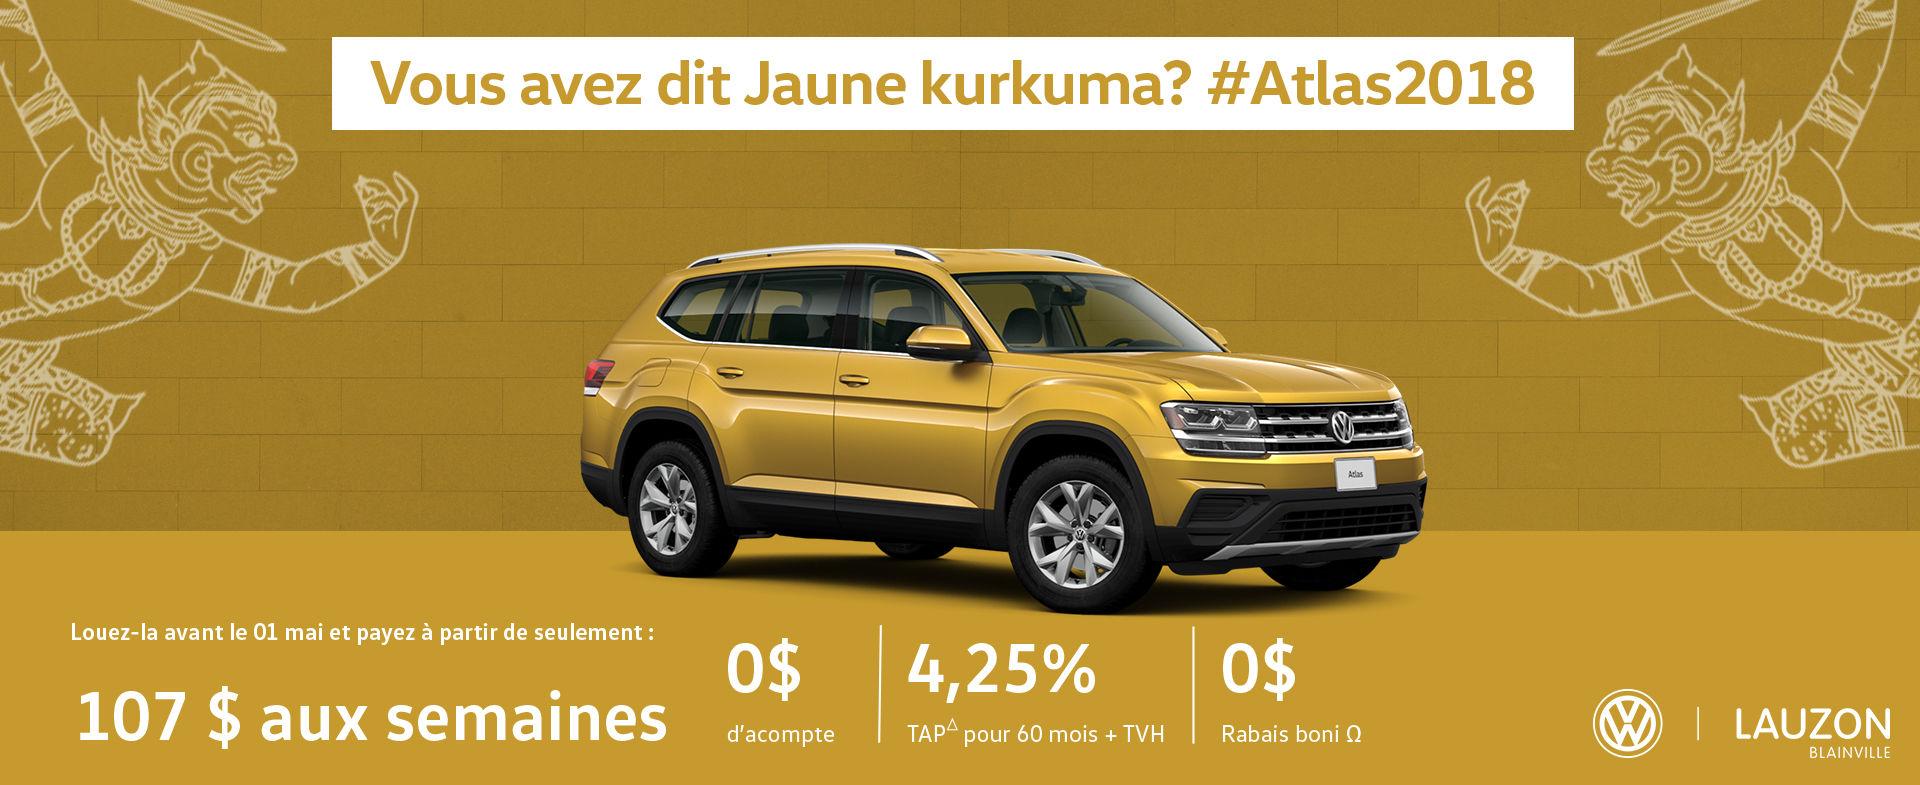 Atlas 2018 - Avril